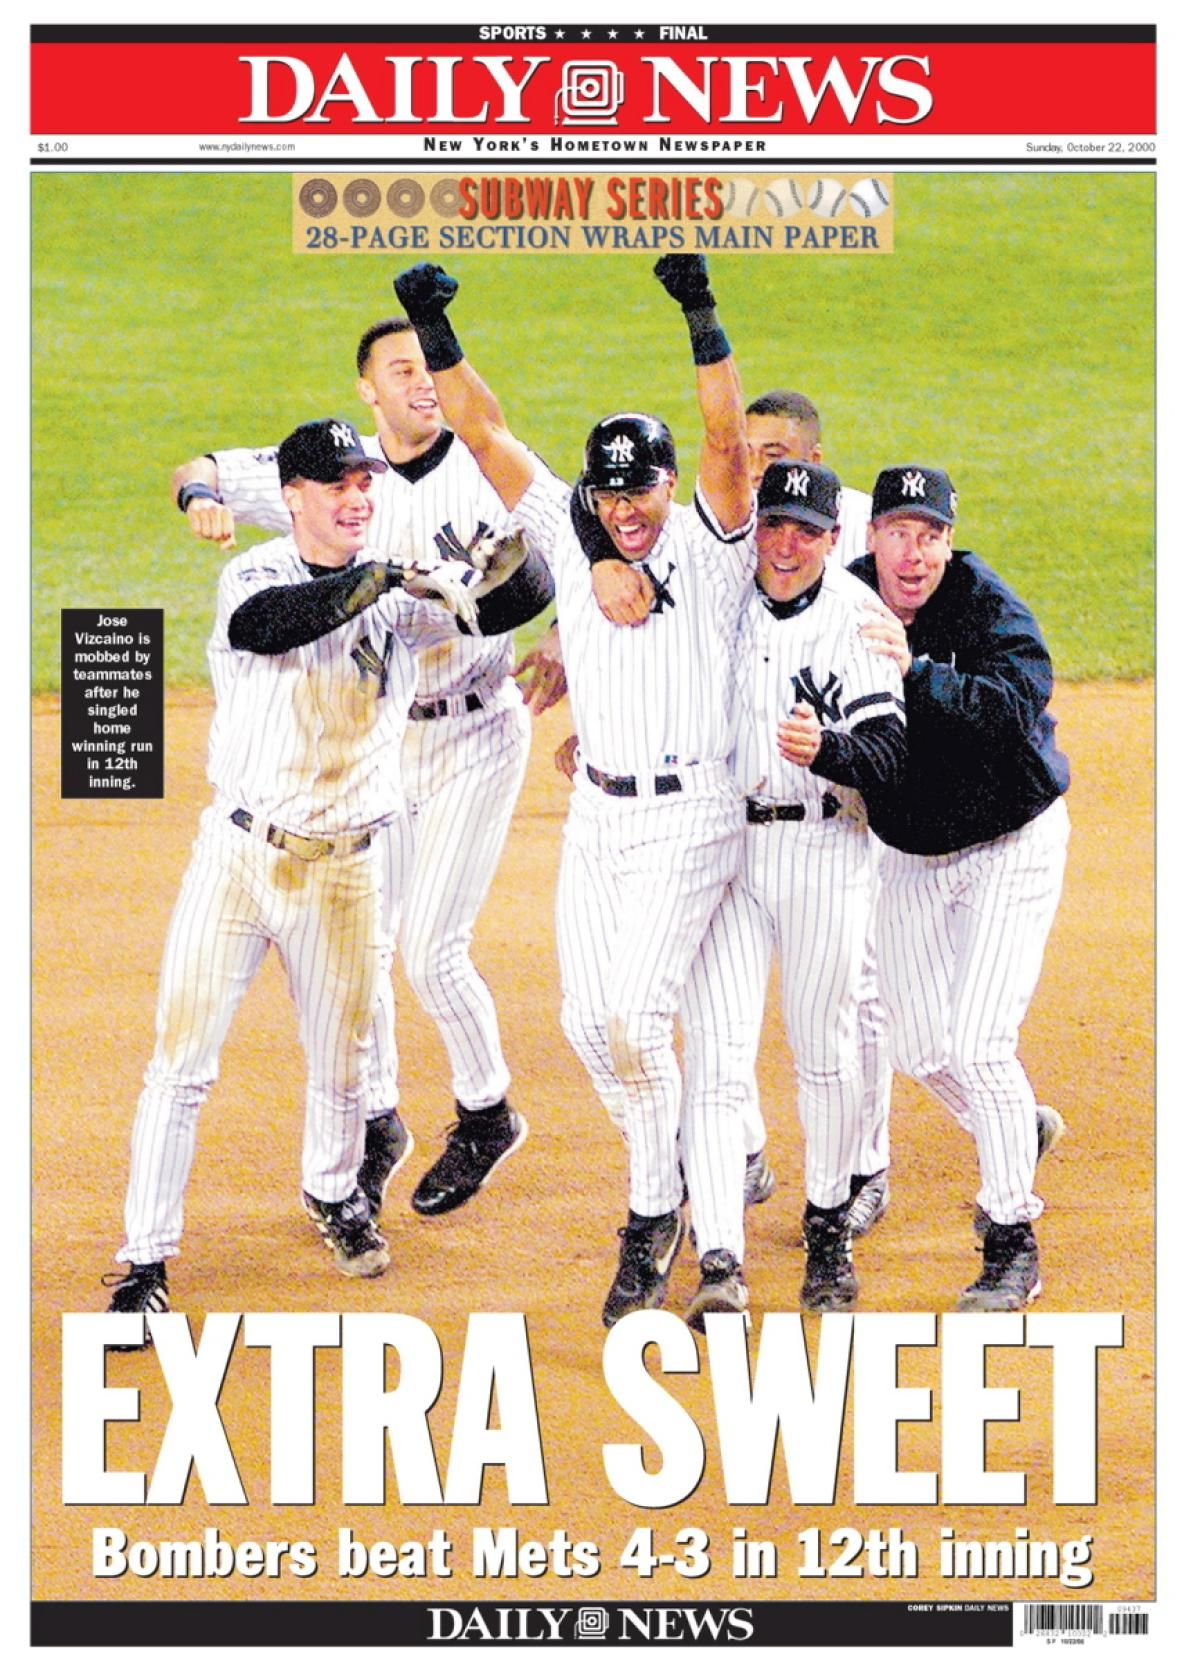 2000 World Series Game 1 Mets Vs Yankees New York Yankees Ny Mets Ny Yankees